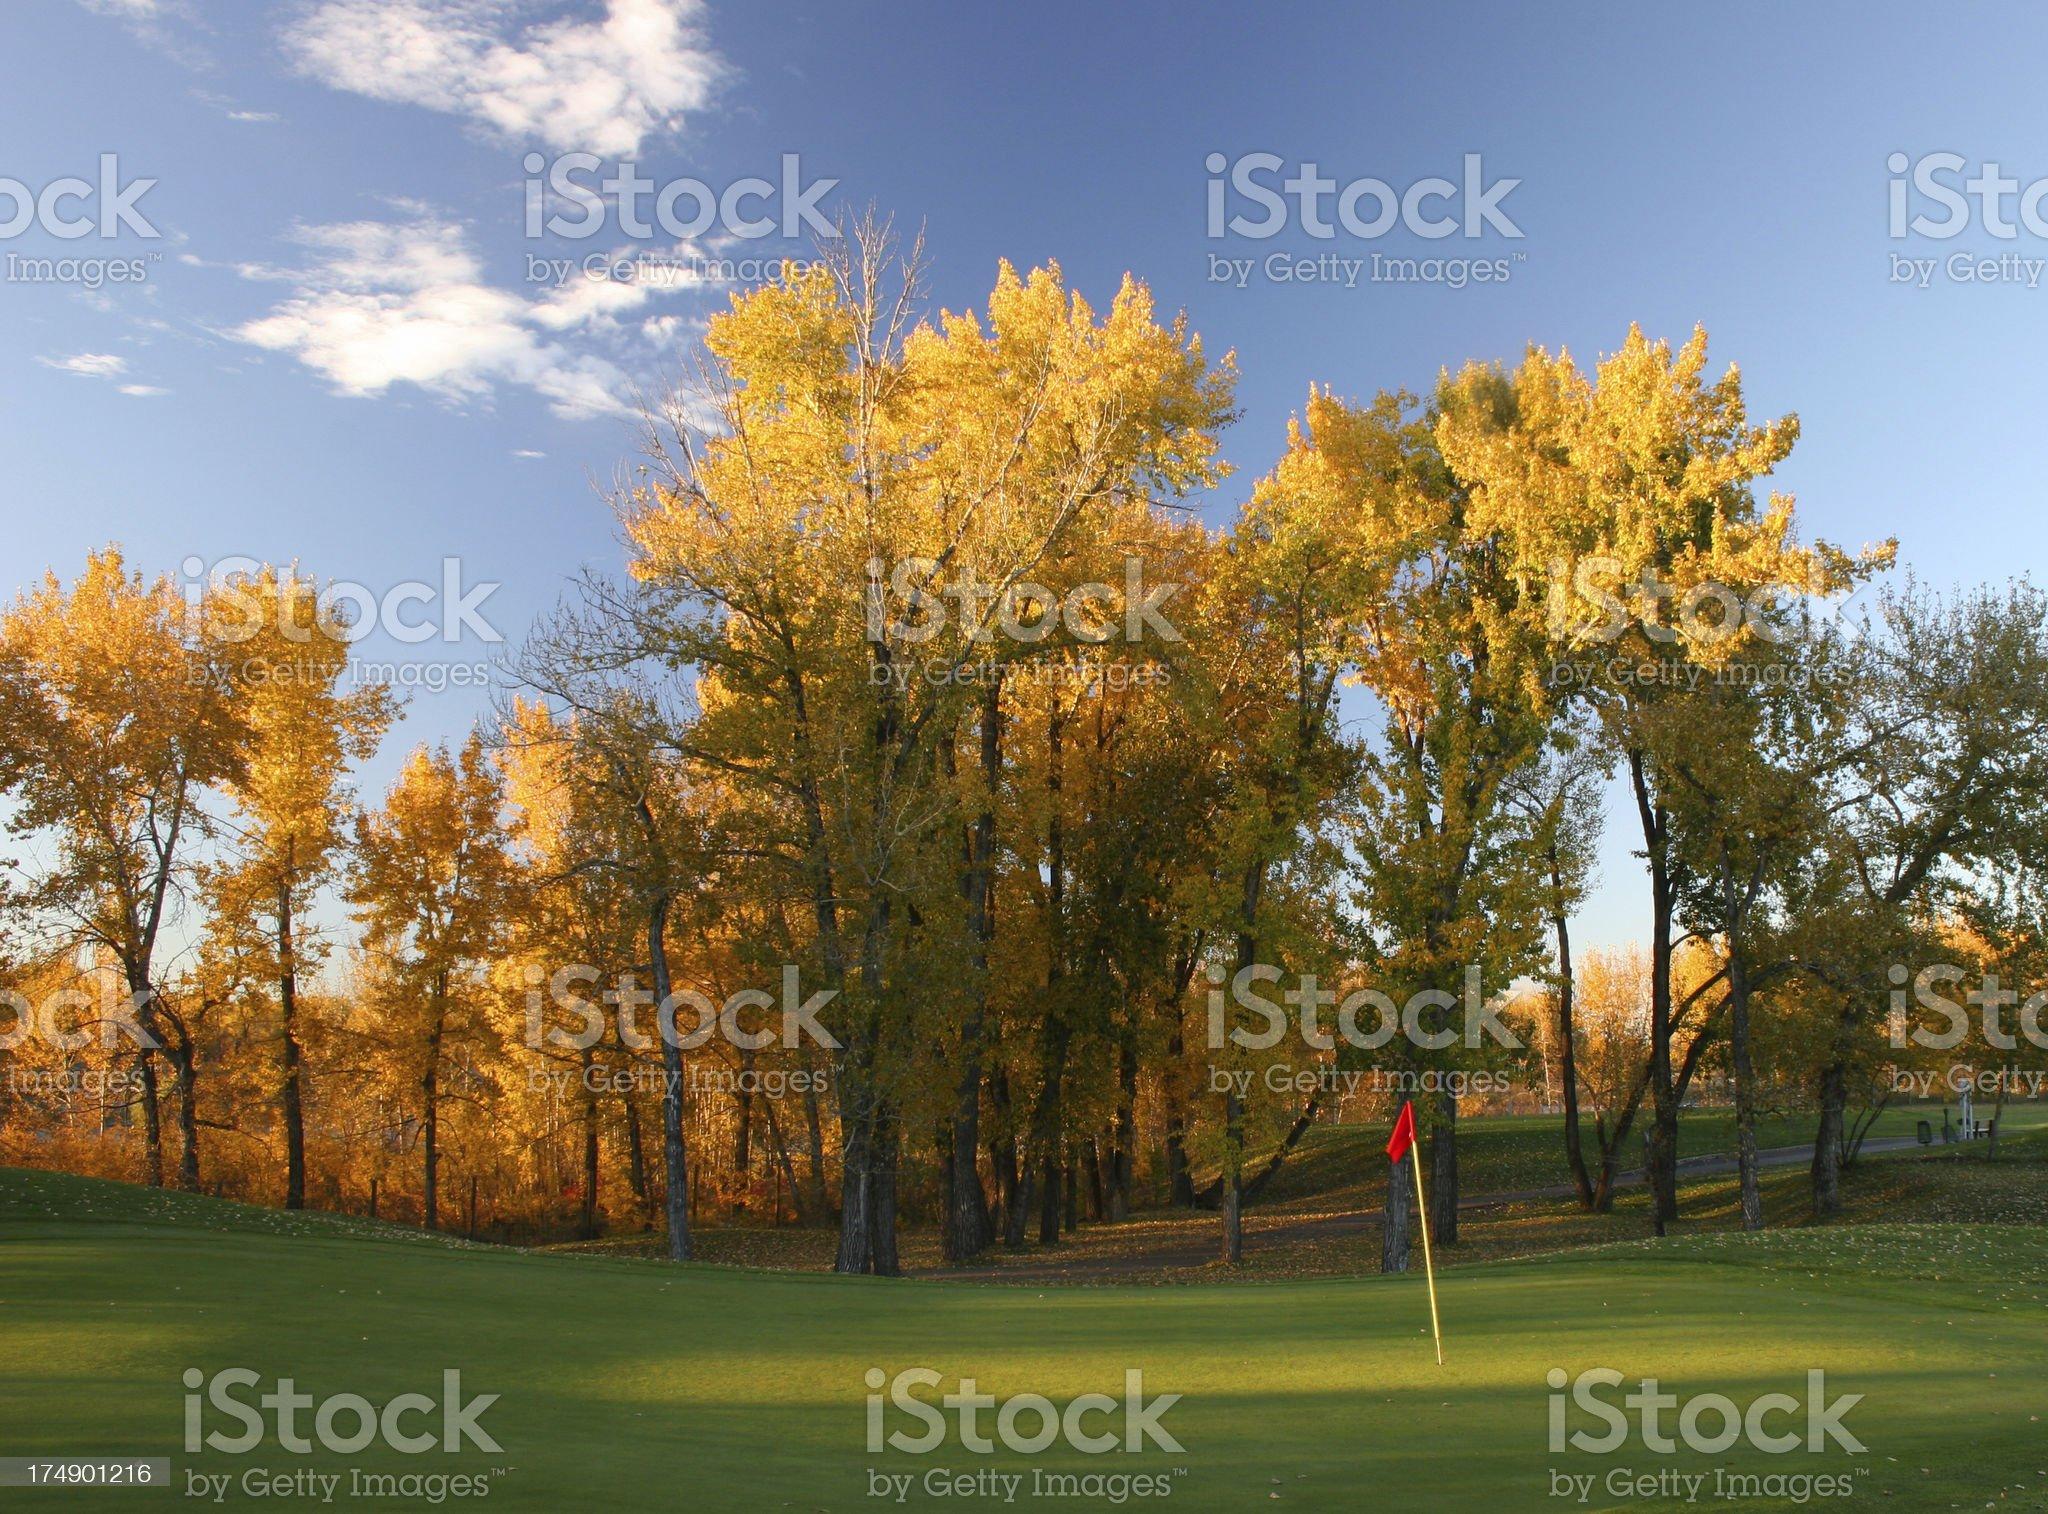 Autumn Golf Scenic royalty-free stock photo